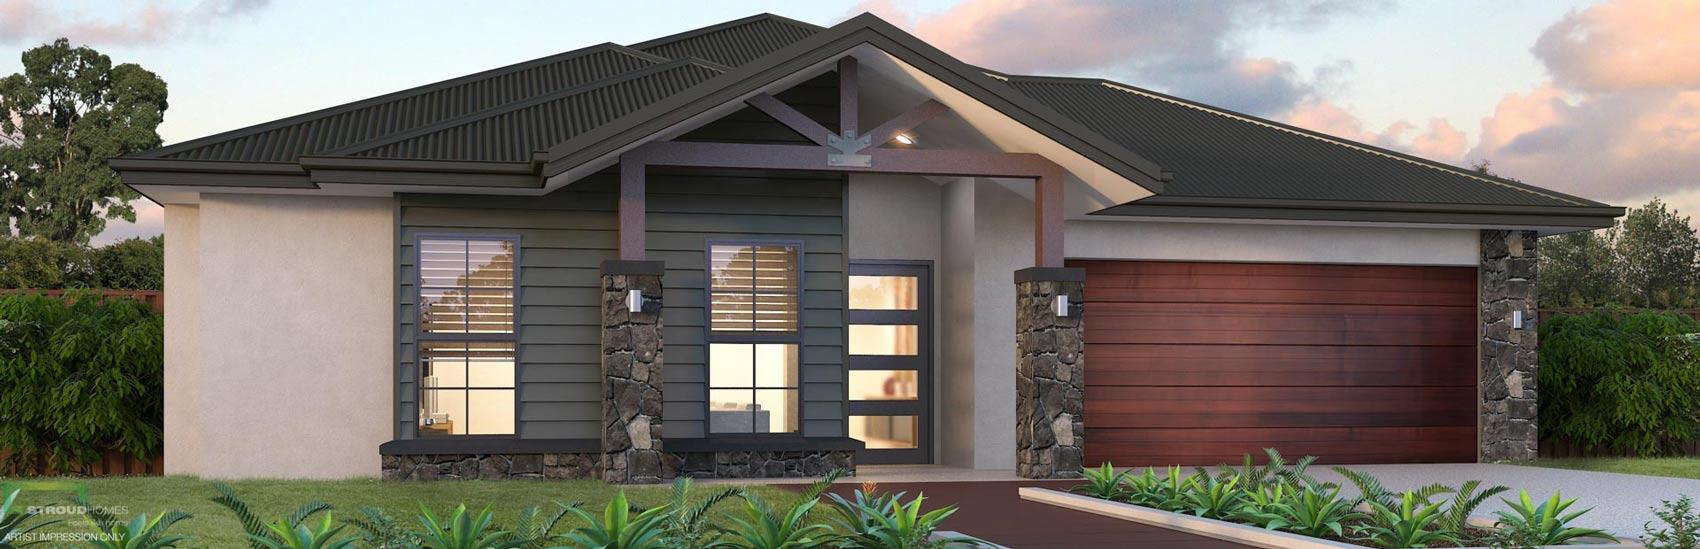 stroud homes papamoa 262 facade